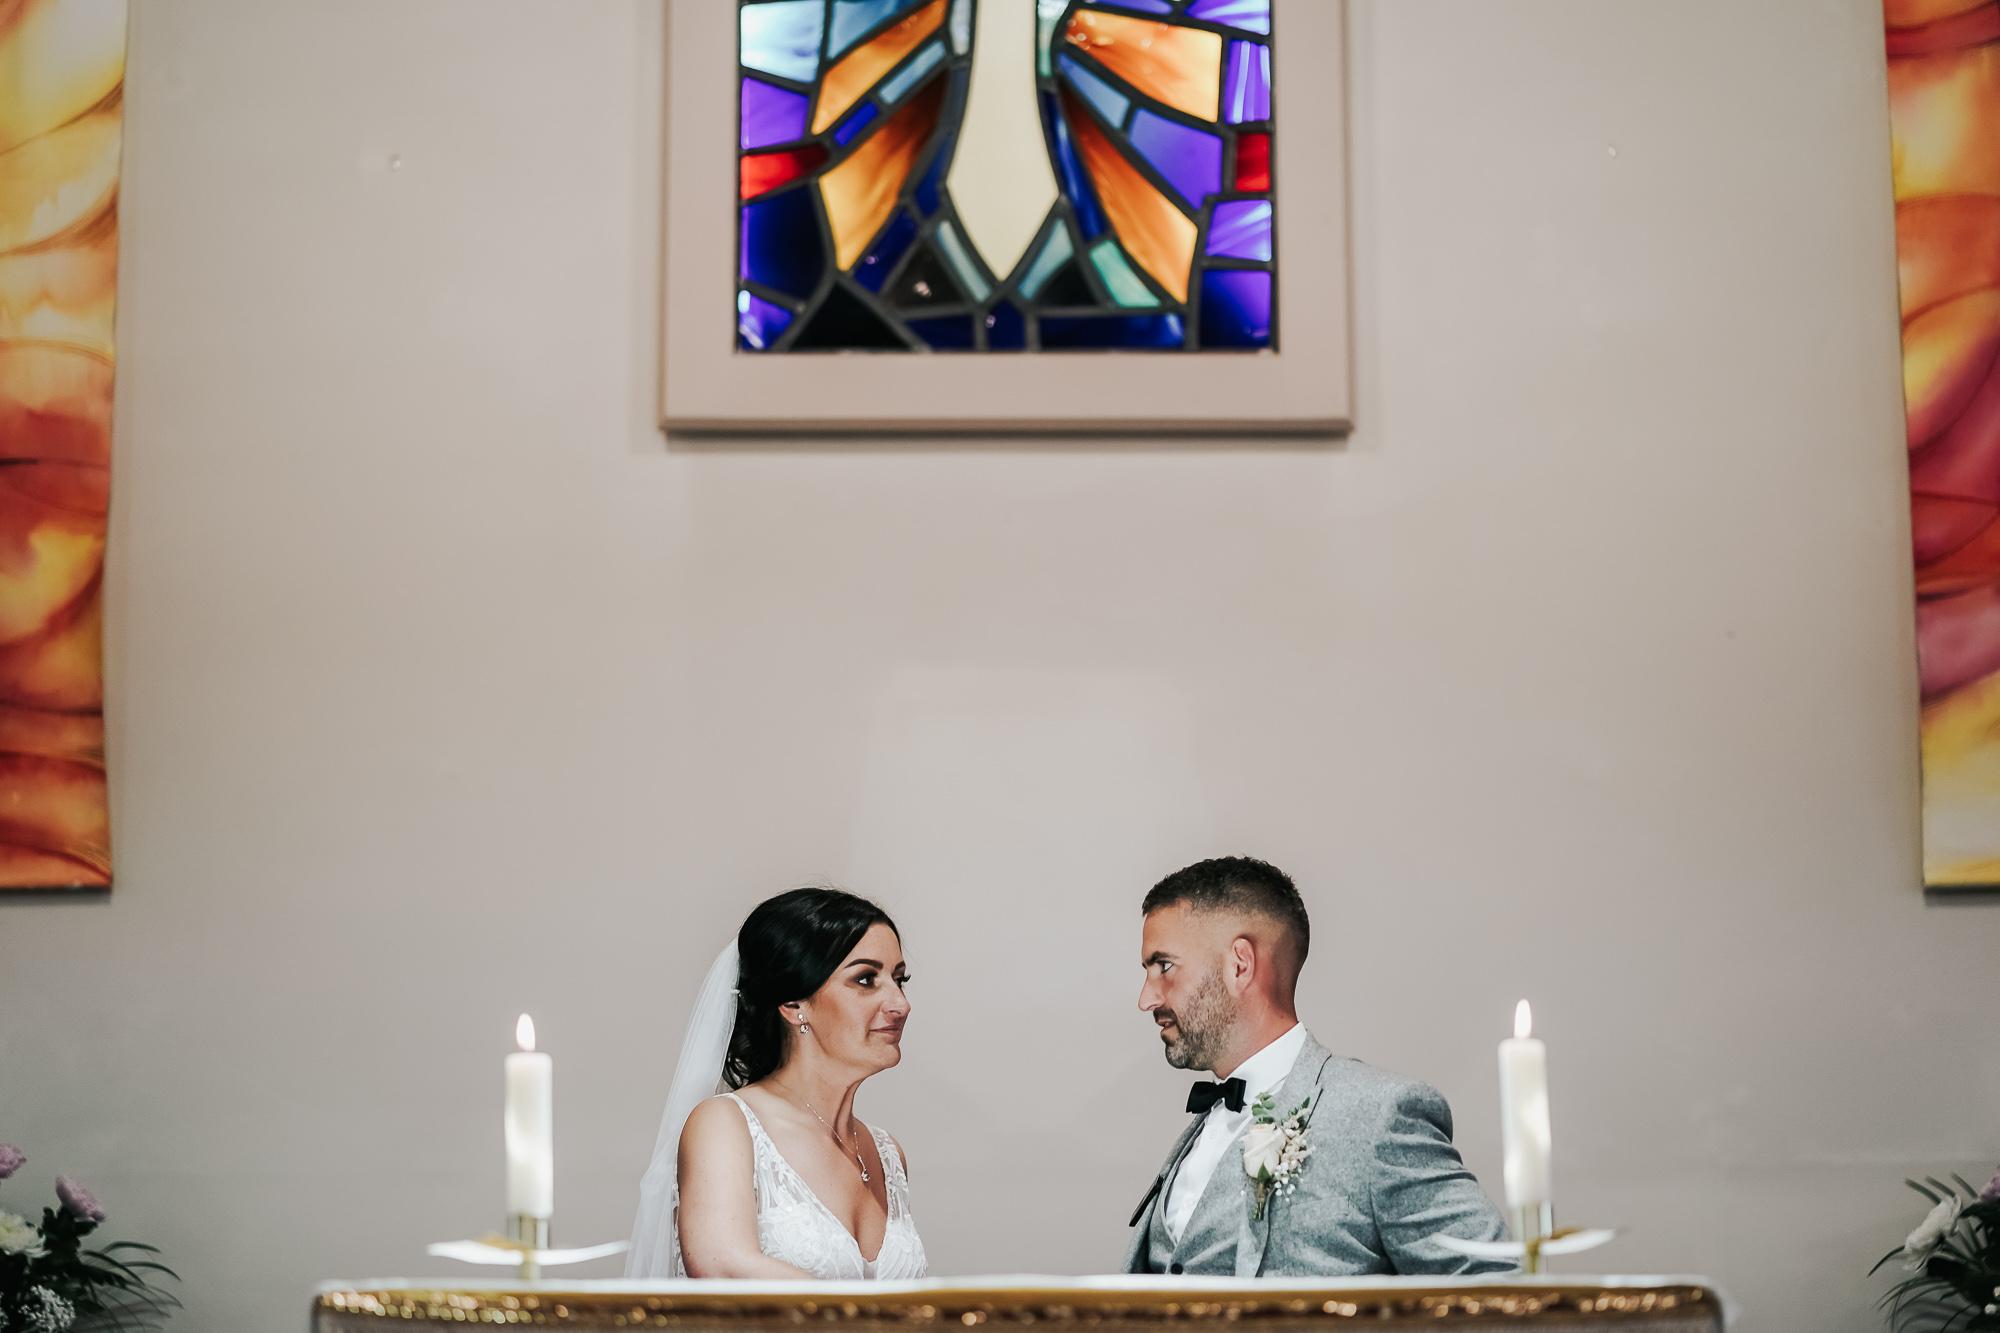 The Hayloft Wedding Photography Cheshire wedding photographer (22 of 52).jpg